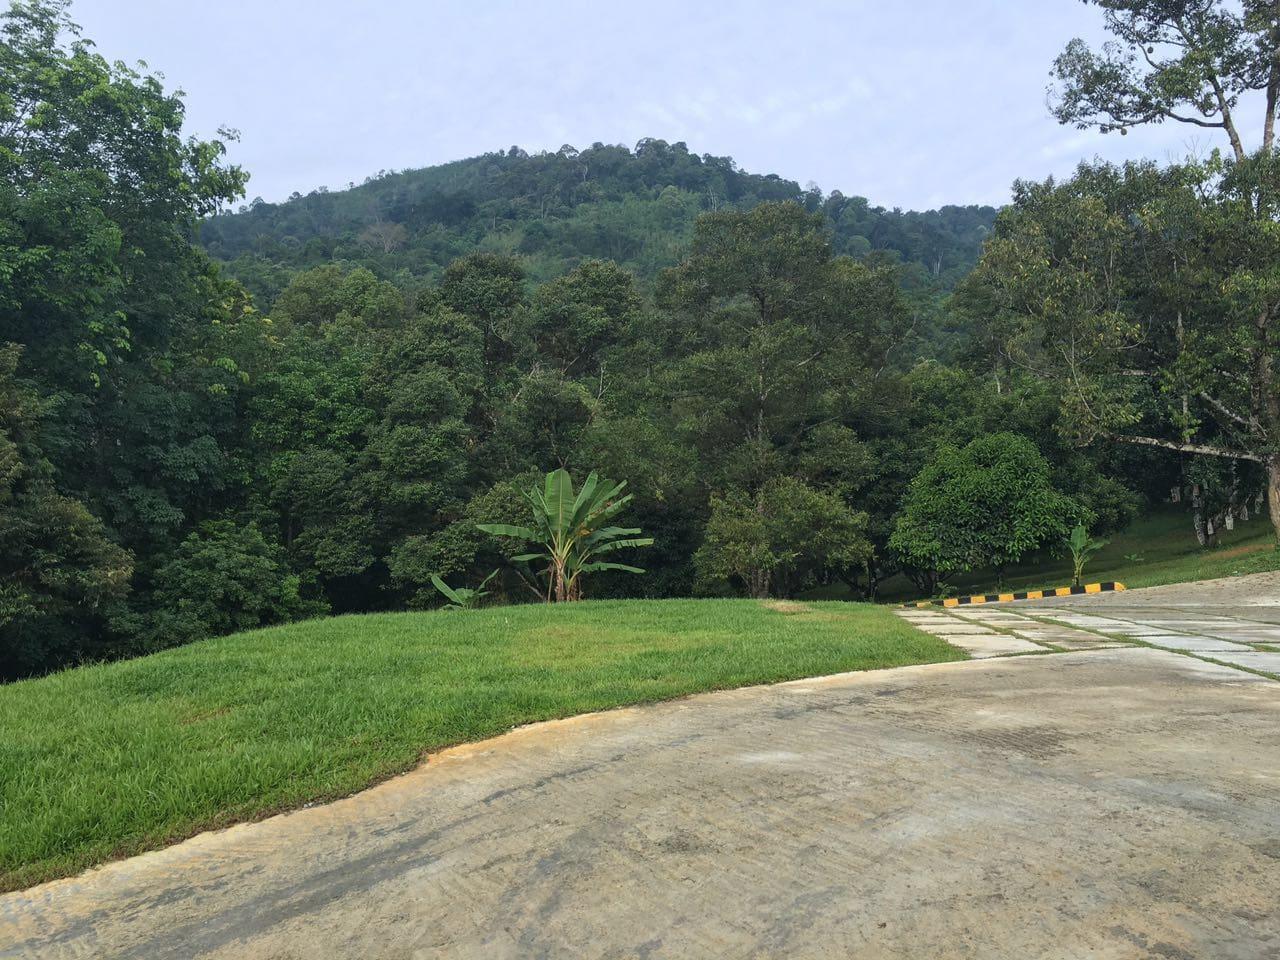 Lush greenary environment